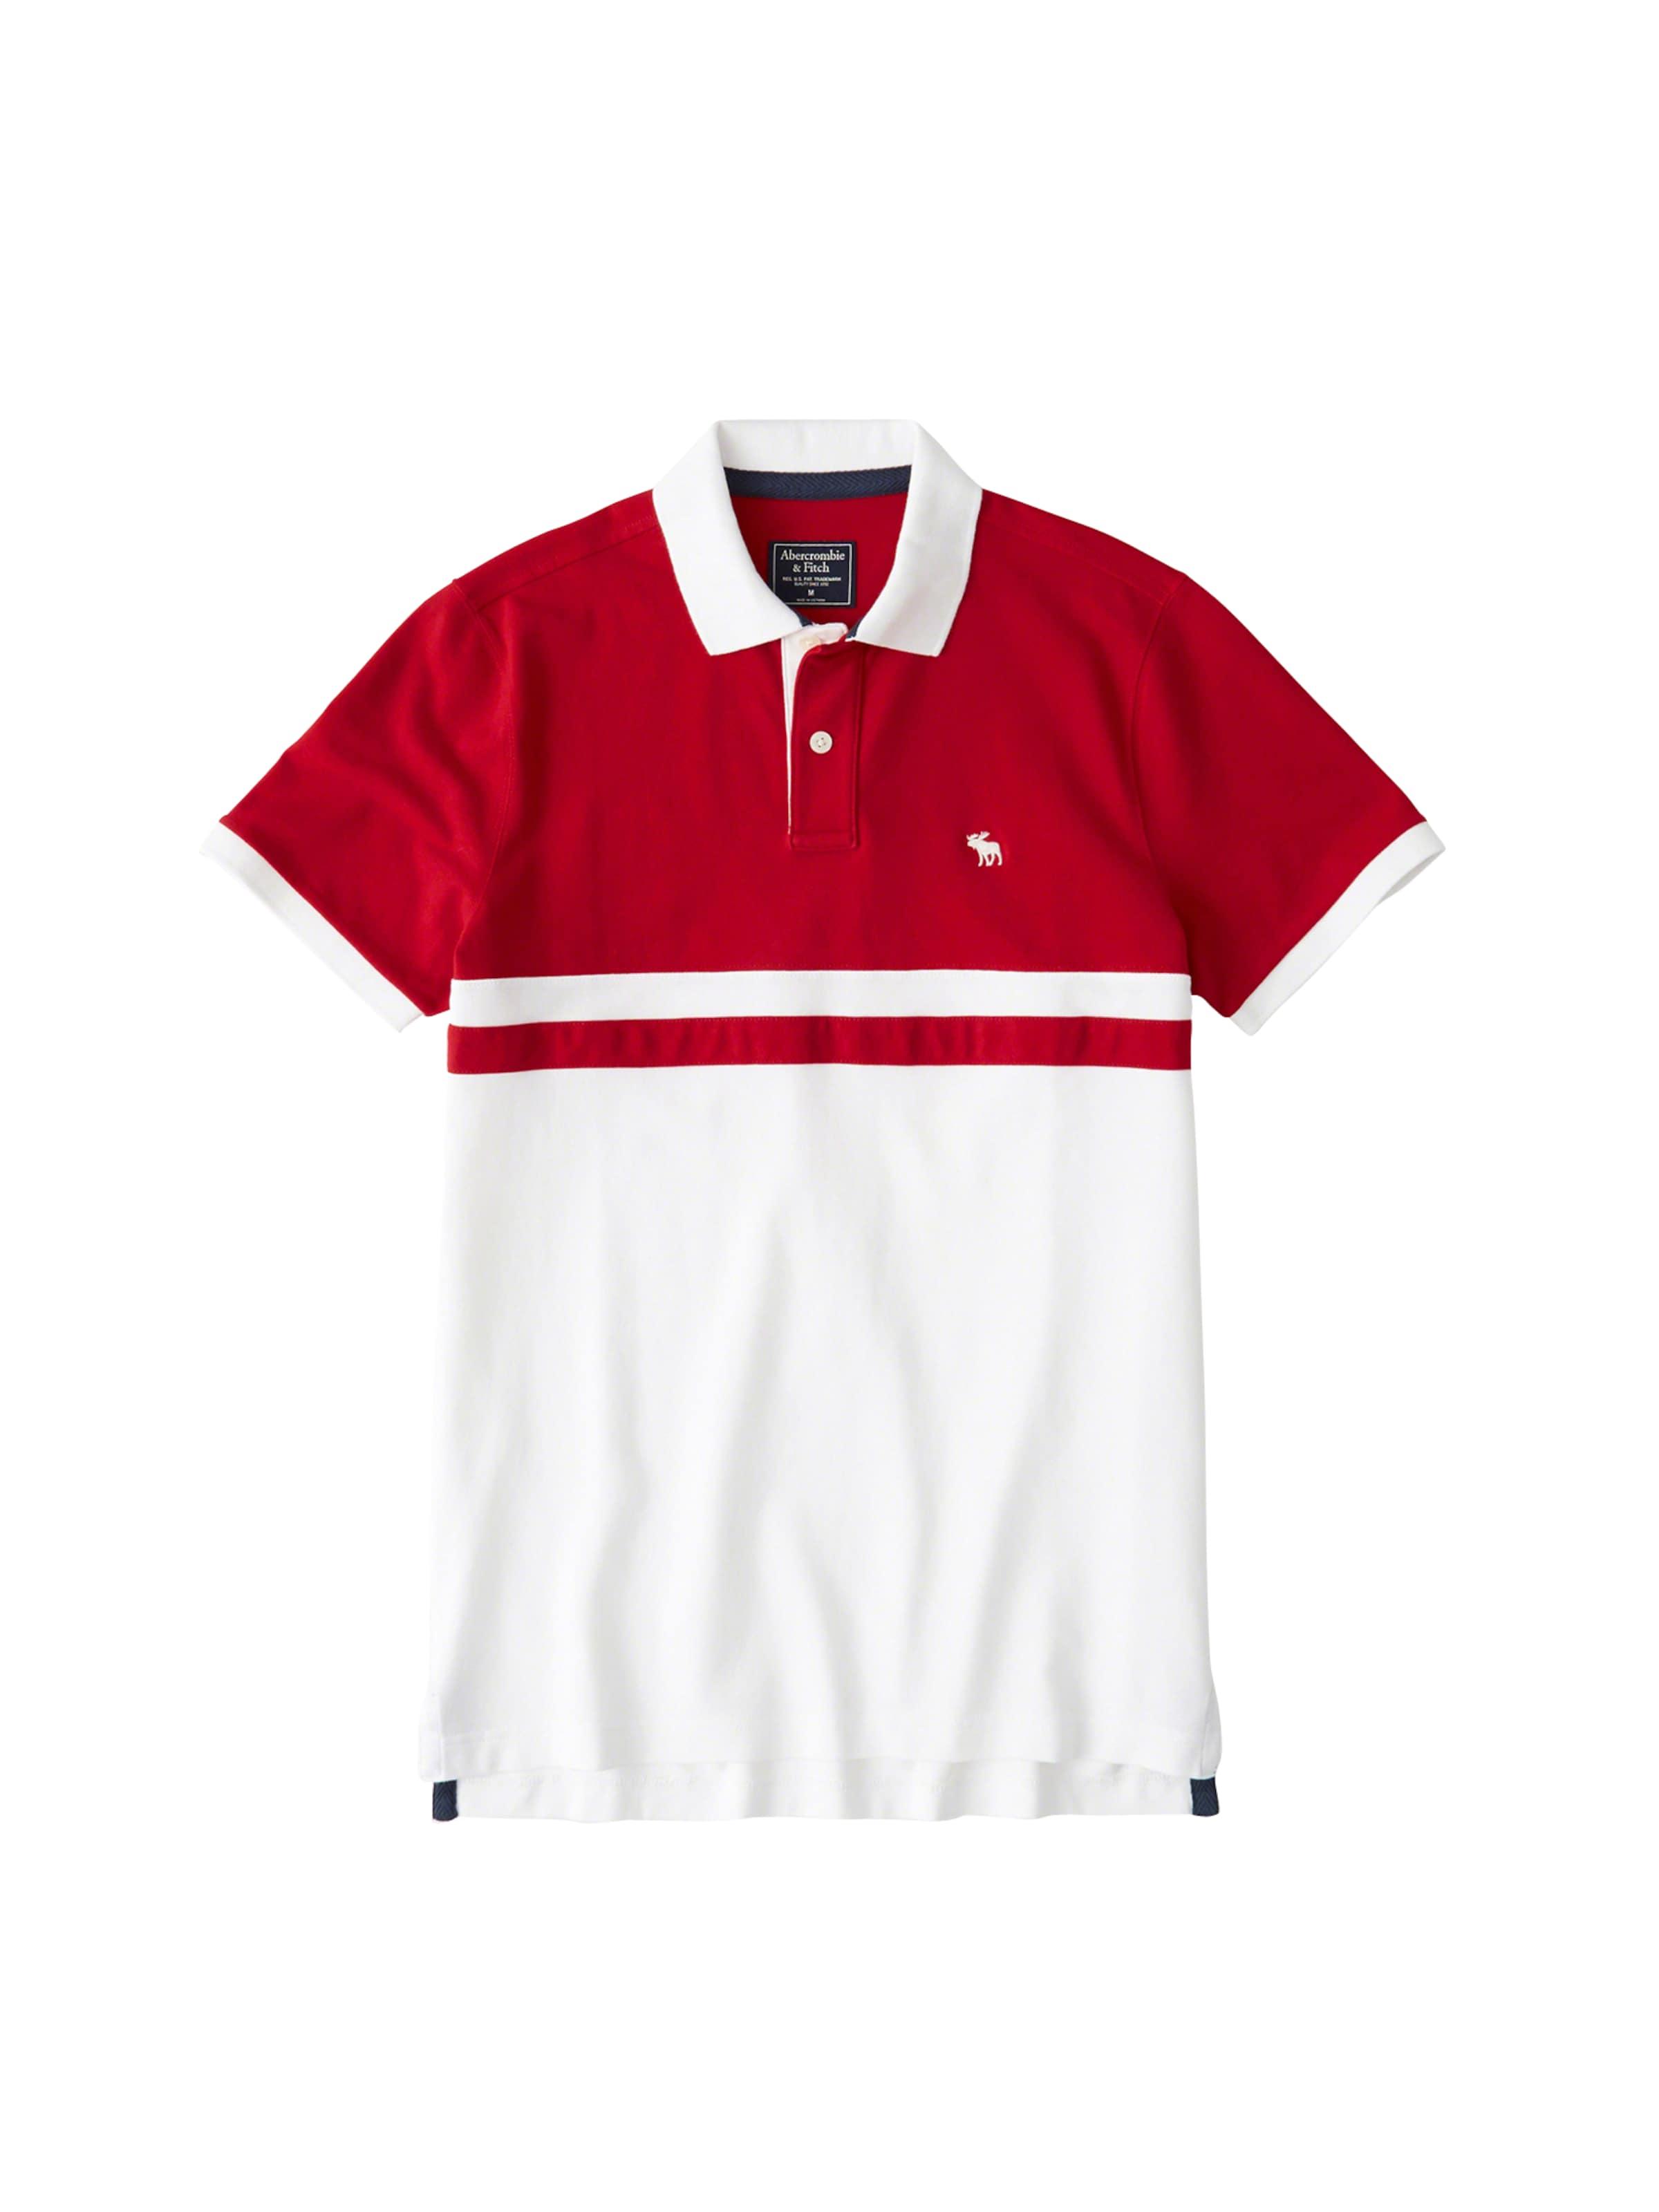 En Abercrombieamp; T Buoy' Fitch shirt 'dtc RougeBlanc fyY6Ib7gv